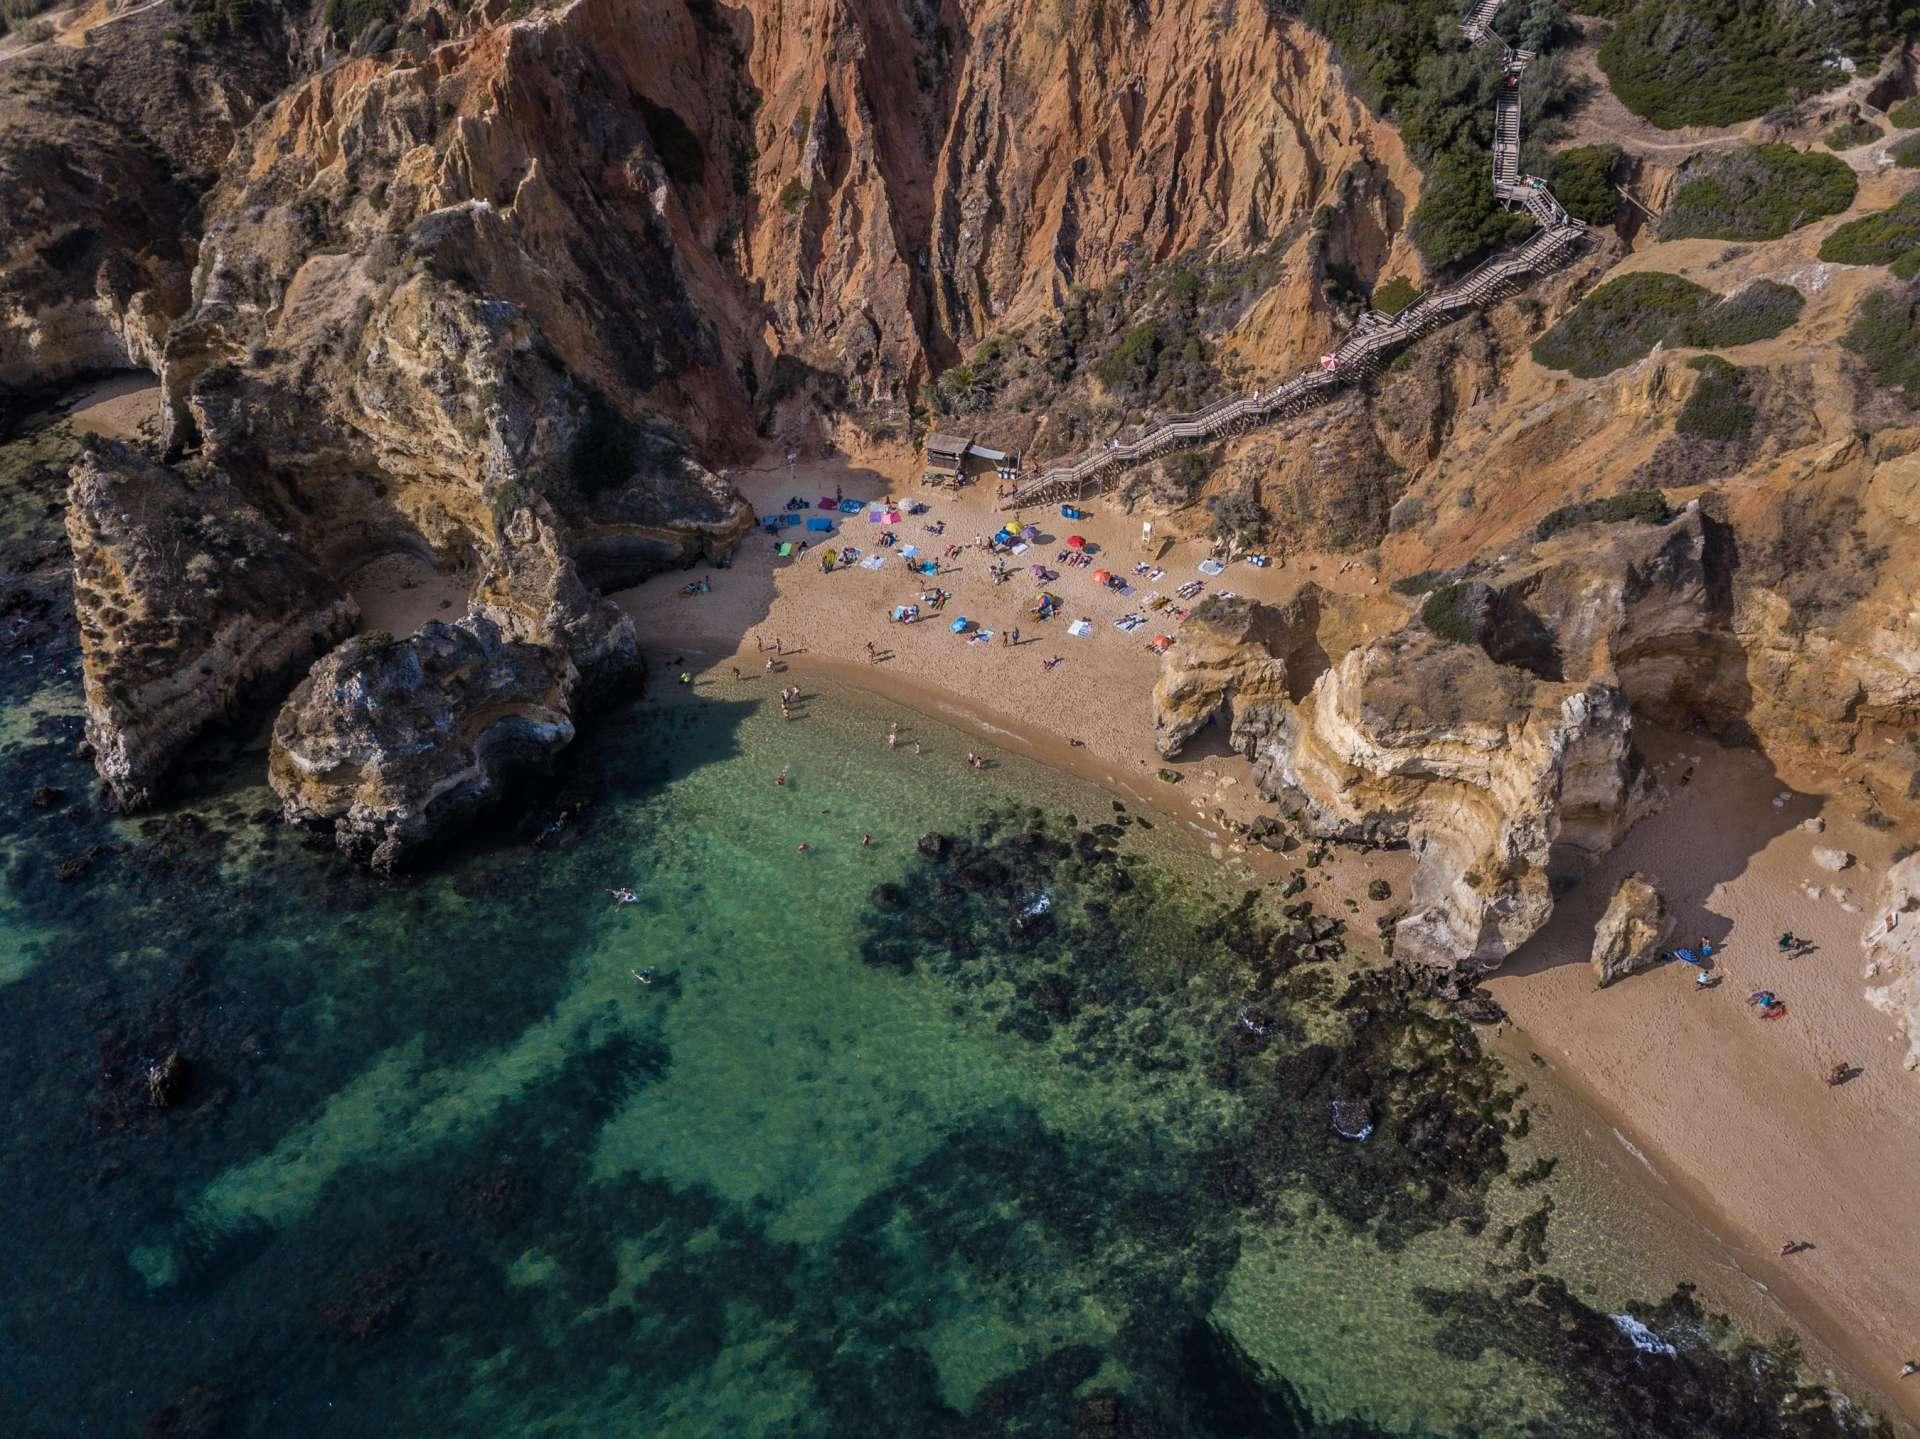 Algarve From Above Drone Photography Enrico Pescantini Praia do Camilo